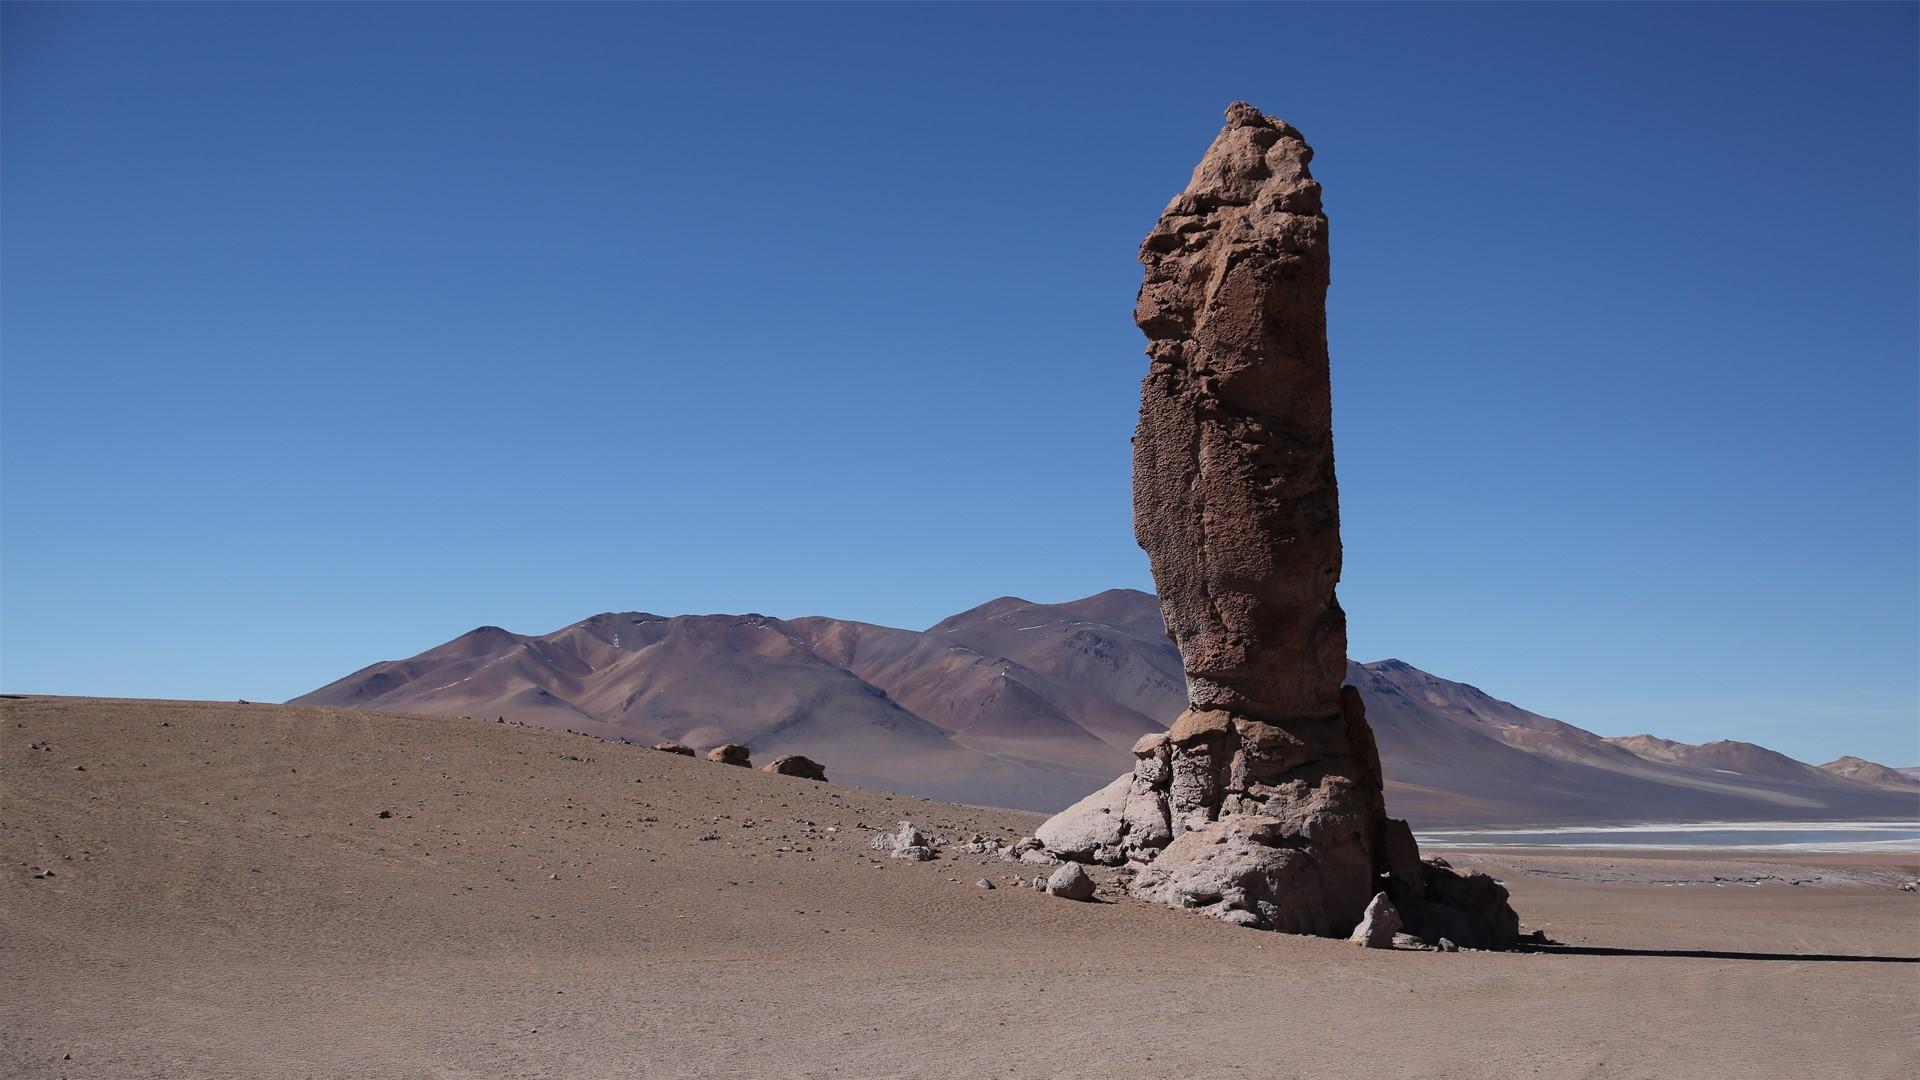 Paisajes desiertos alrededor de San Pedro de Atacama